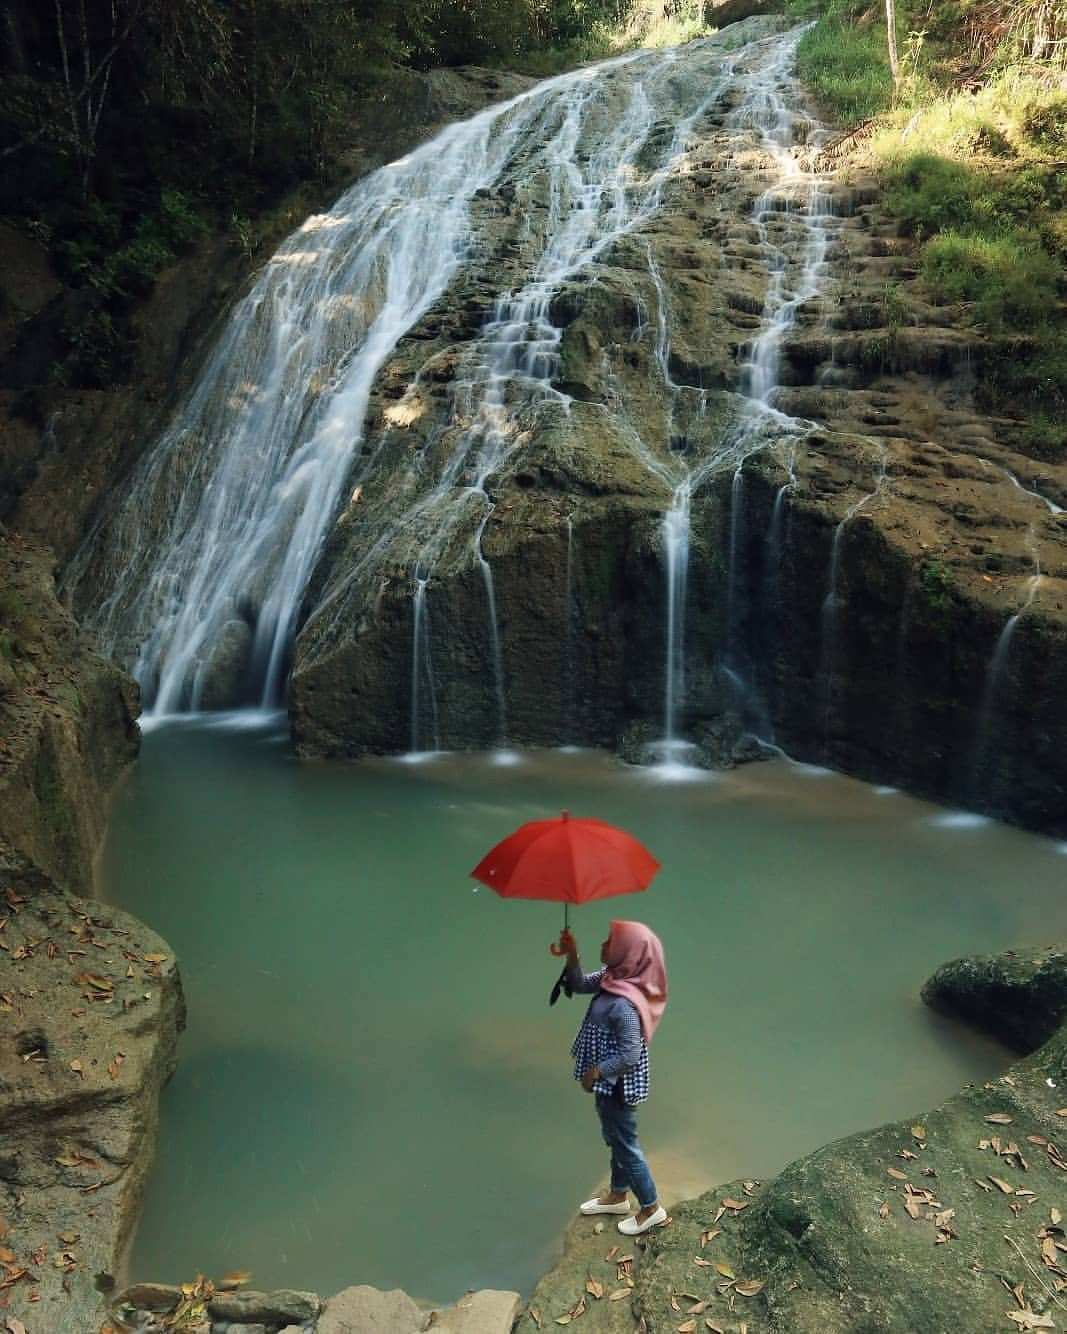 Berfoto di Bawah Air Terjun Banyunibo Kabrokan Jogja Image From @yosafatyk